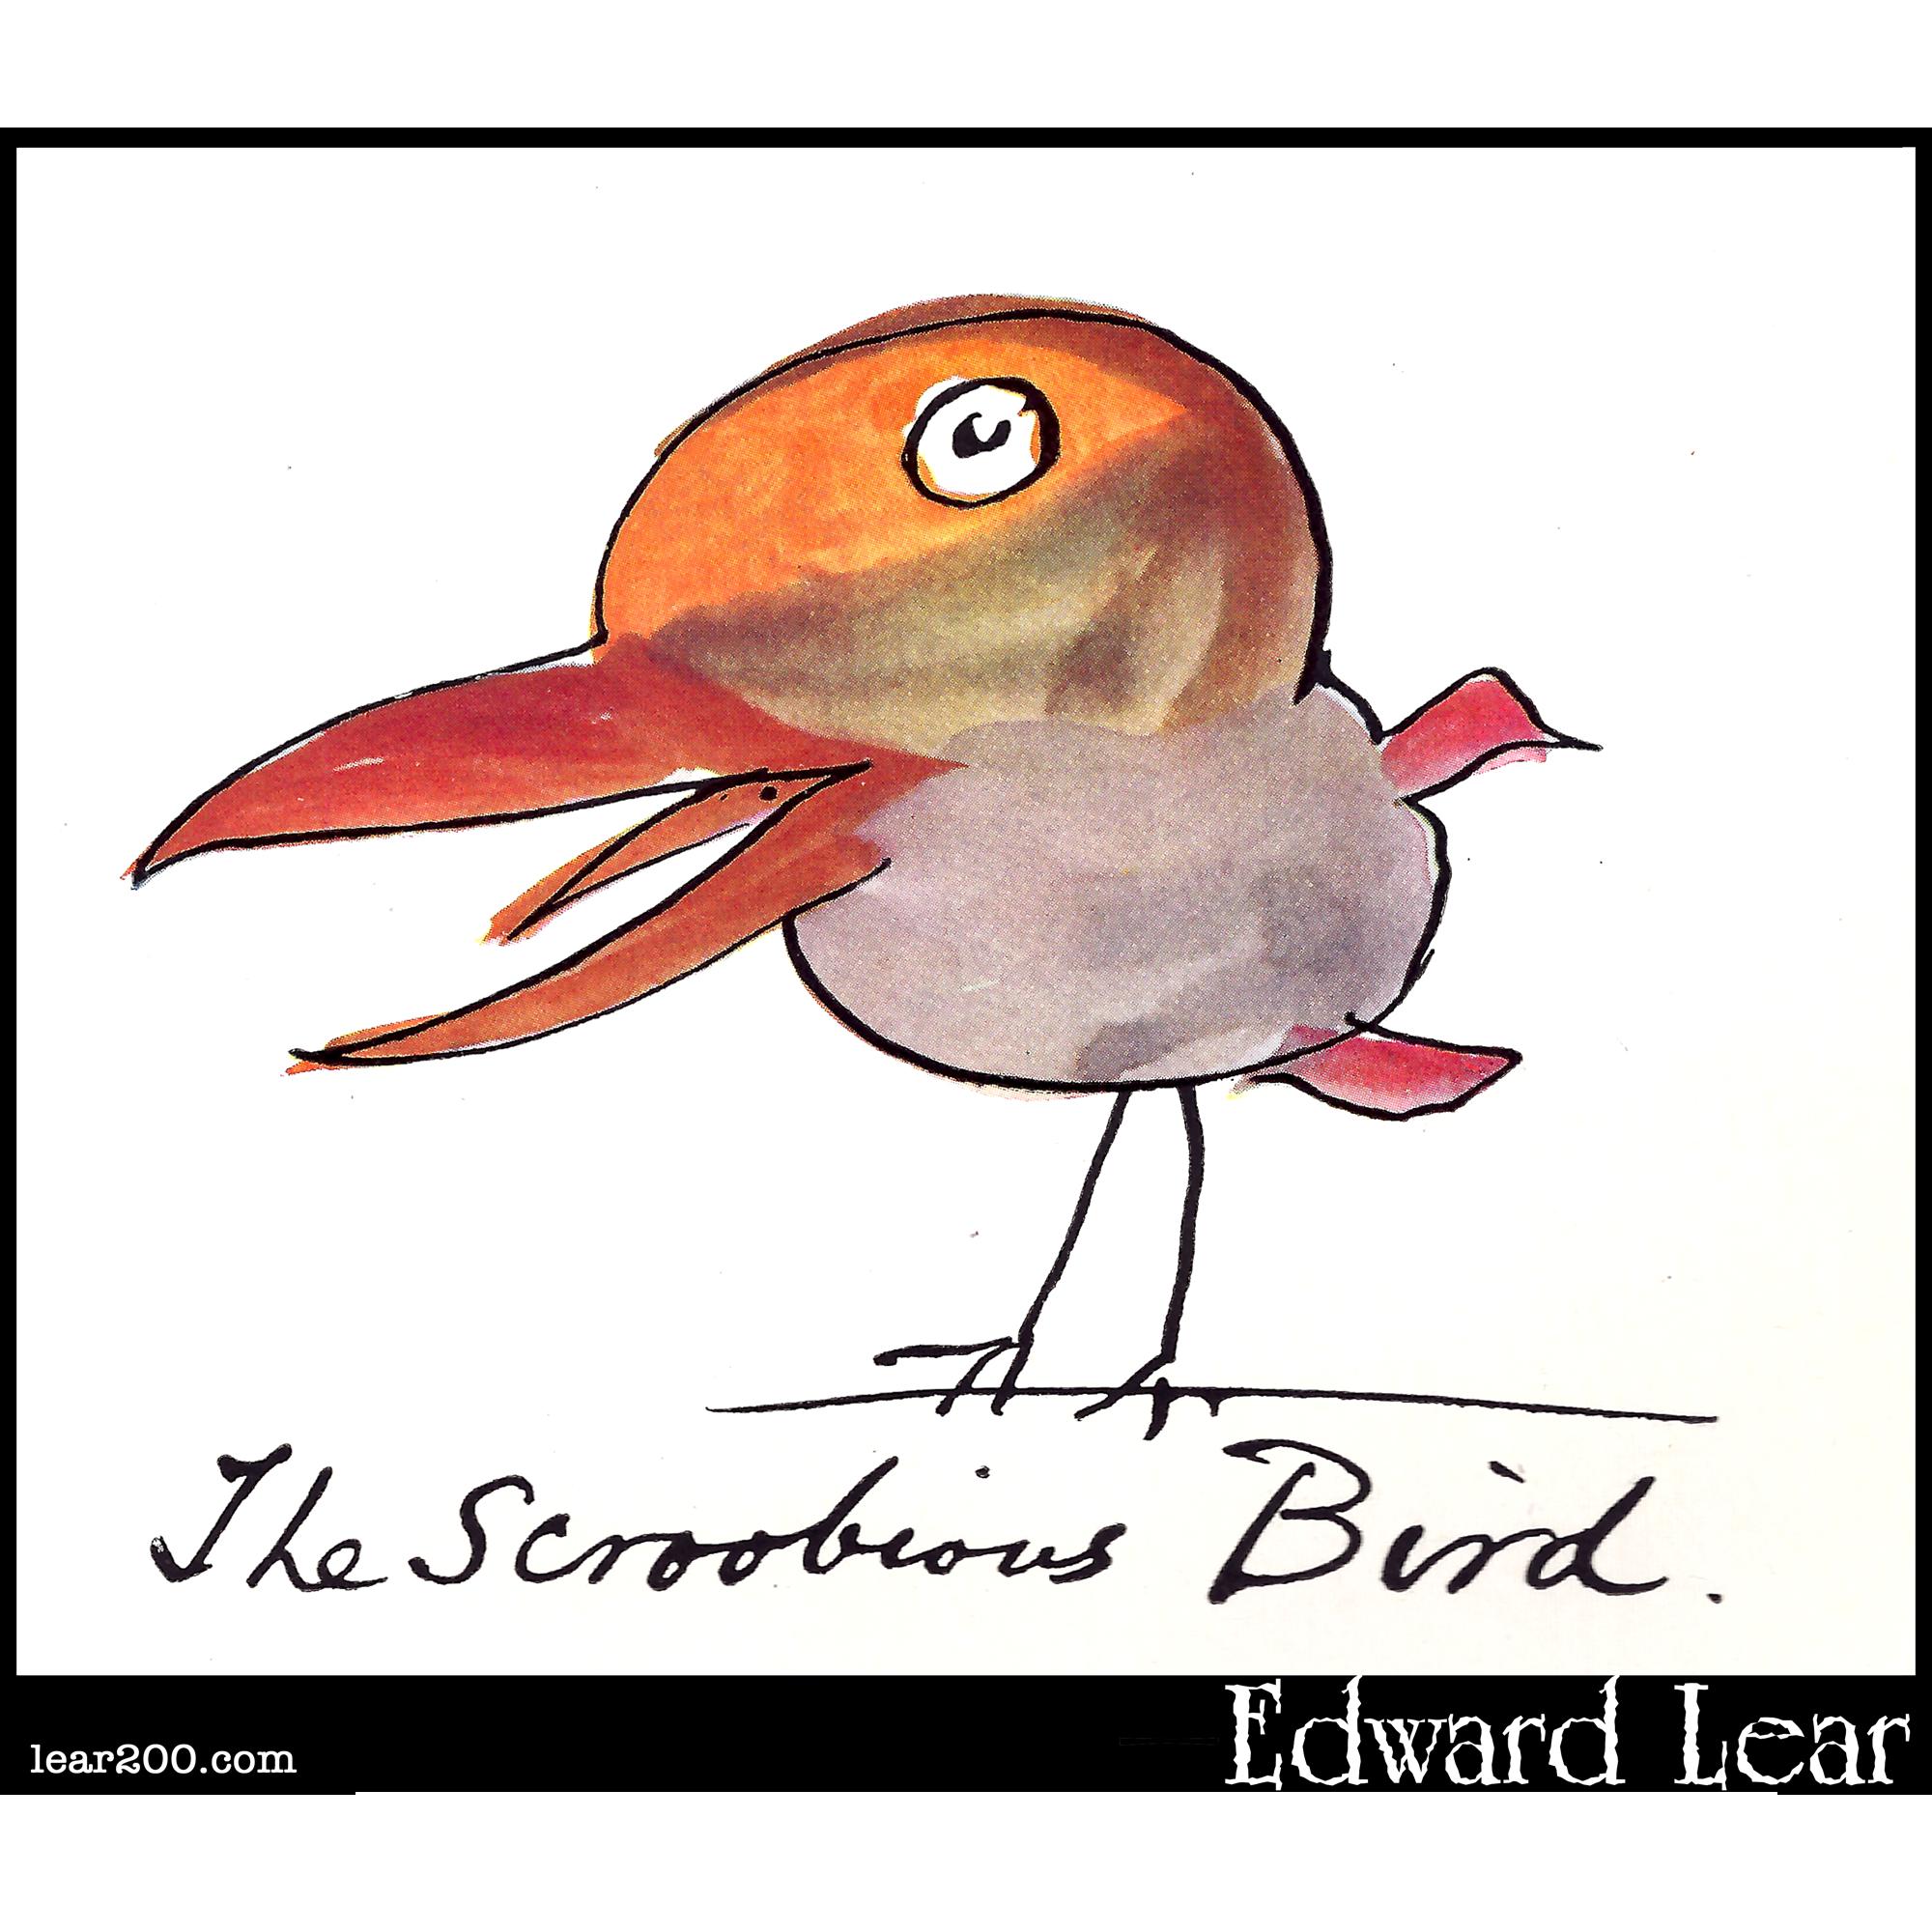 The Scroobious Bird